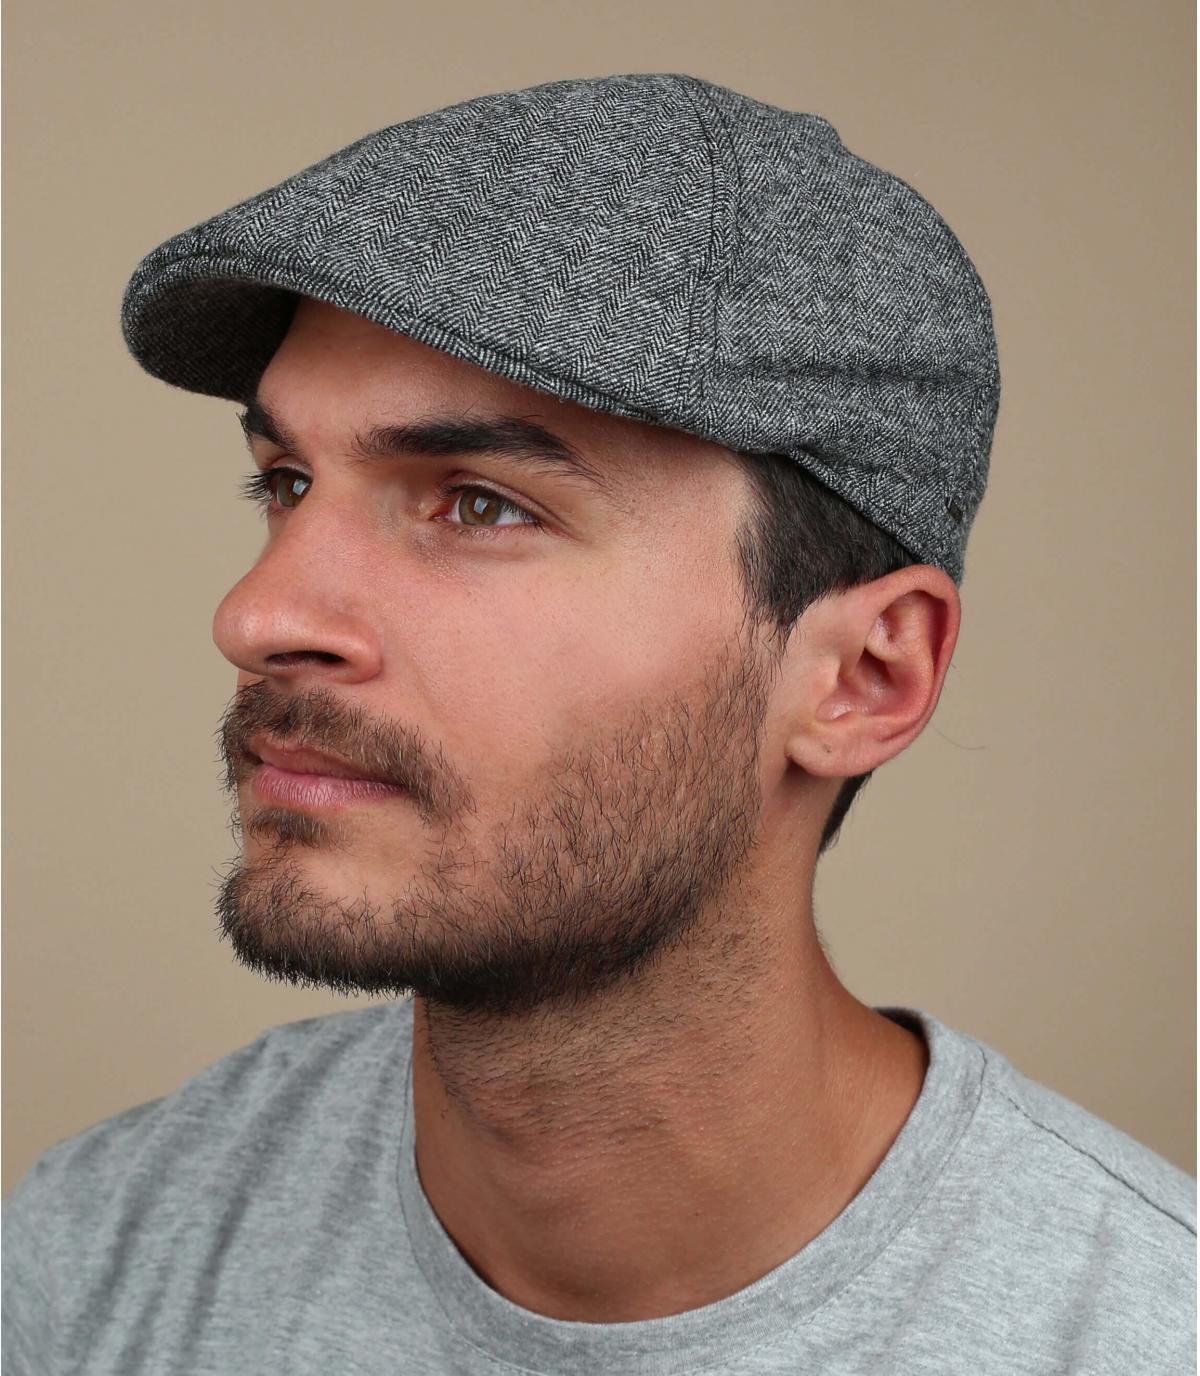 gorra de algodón negro de pico de pato